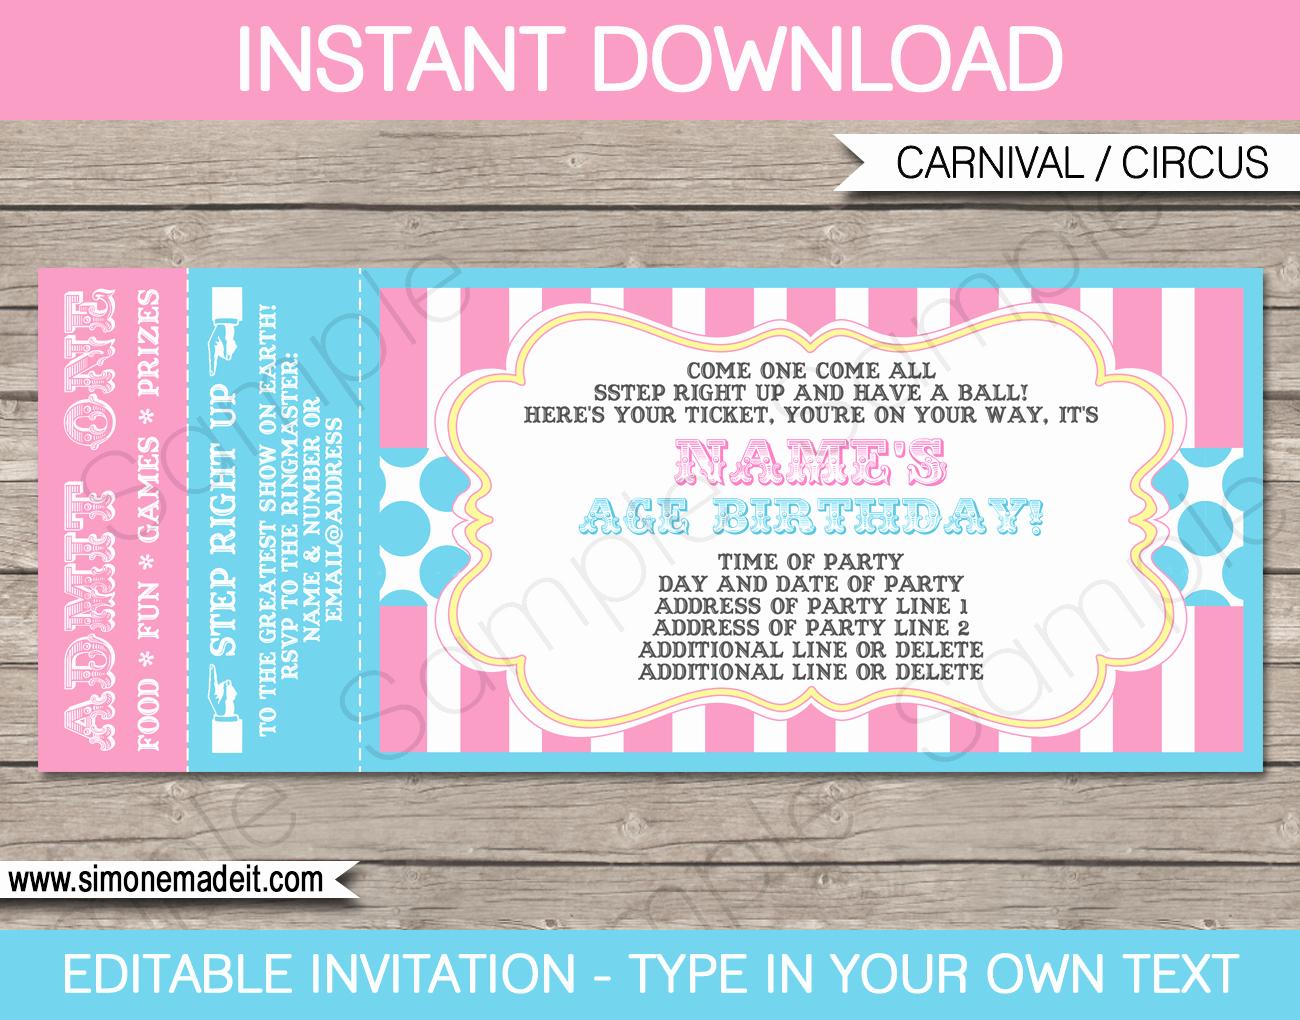 Carnival Ticket Template Luxury Carnival Ticket Invitations Template Carnival